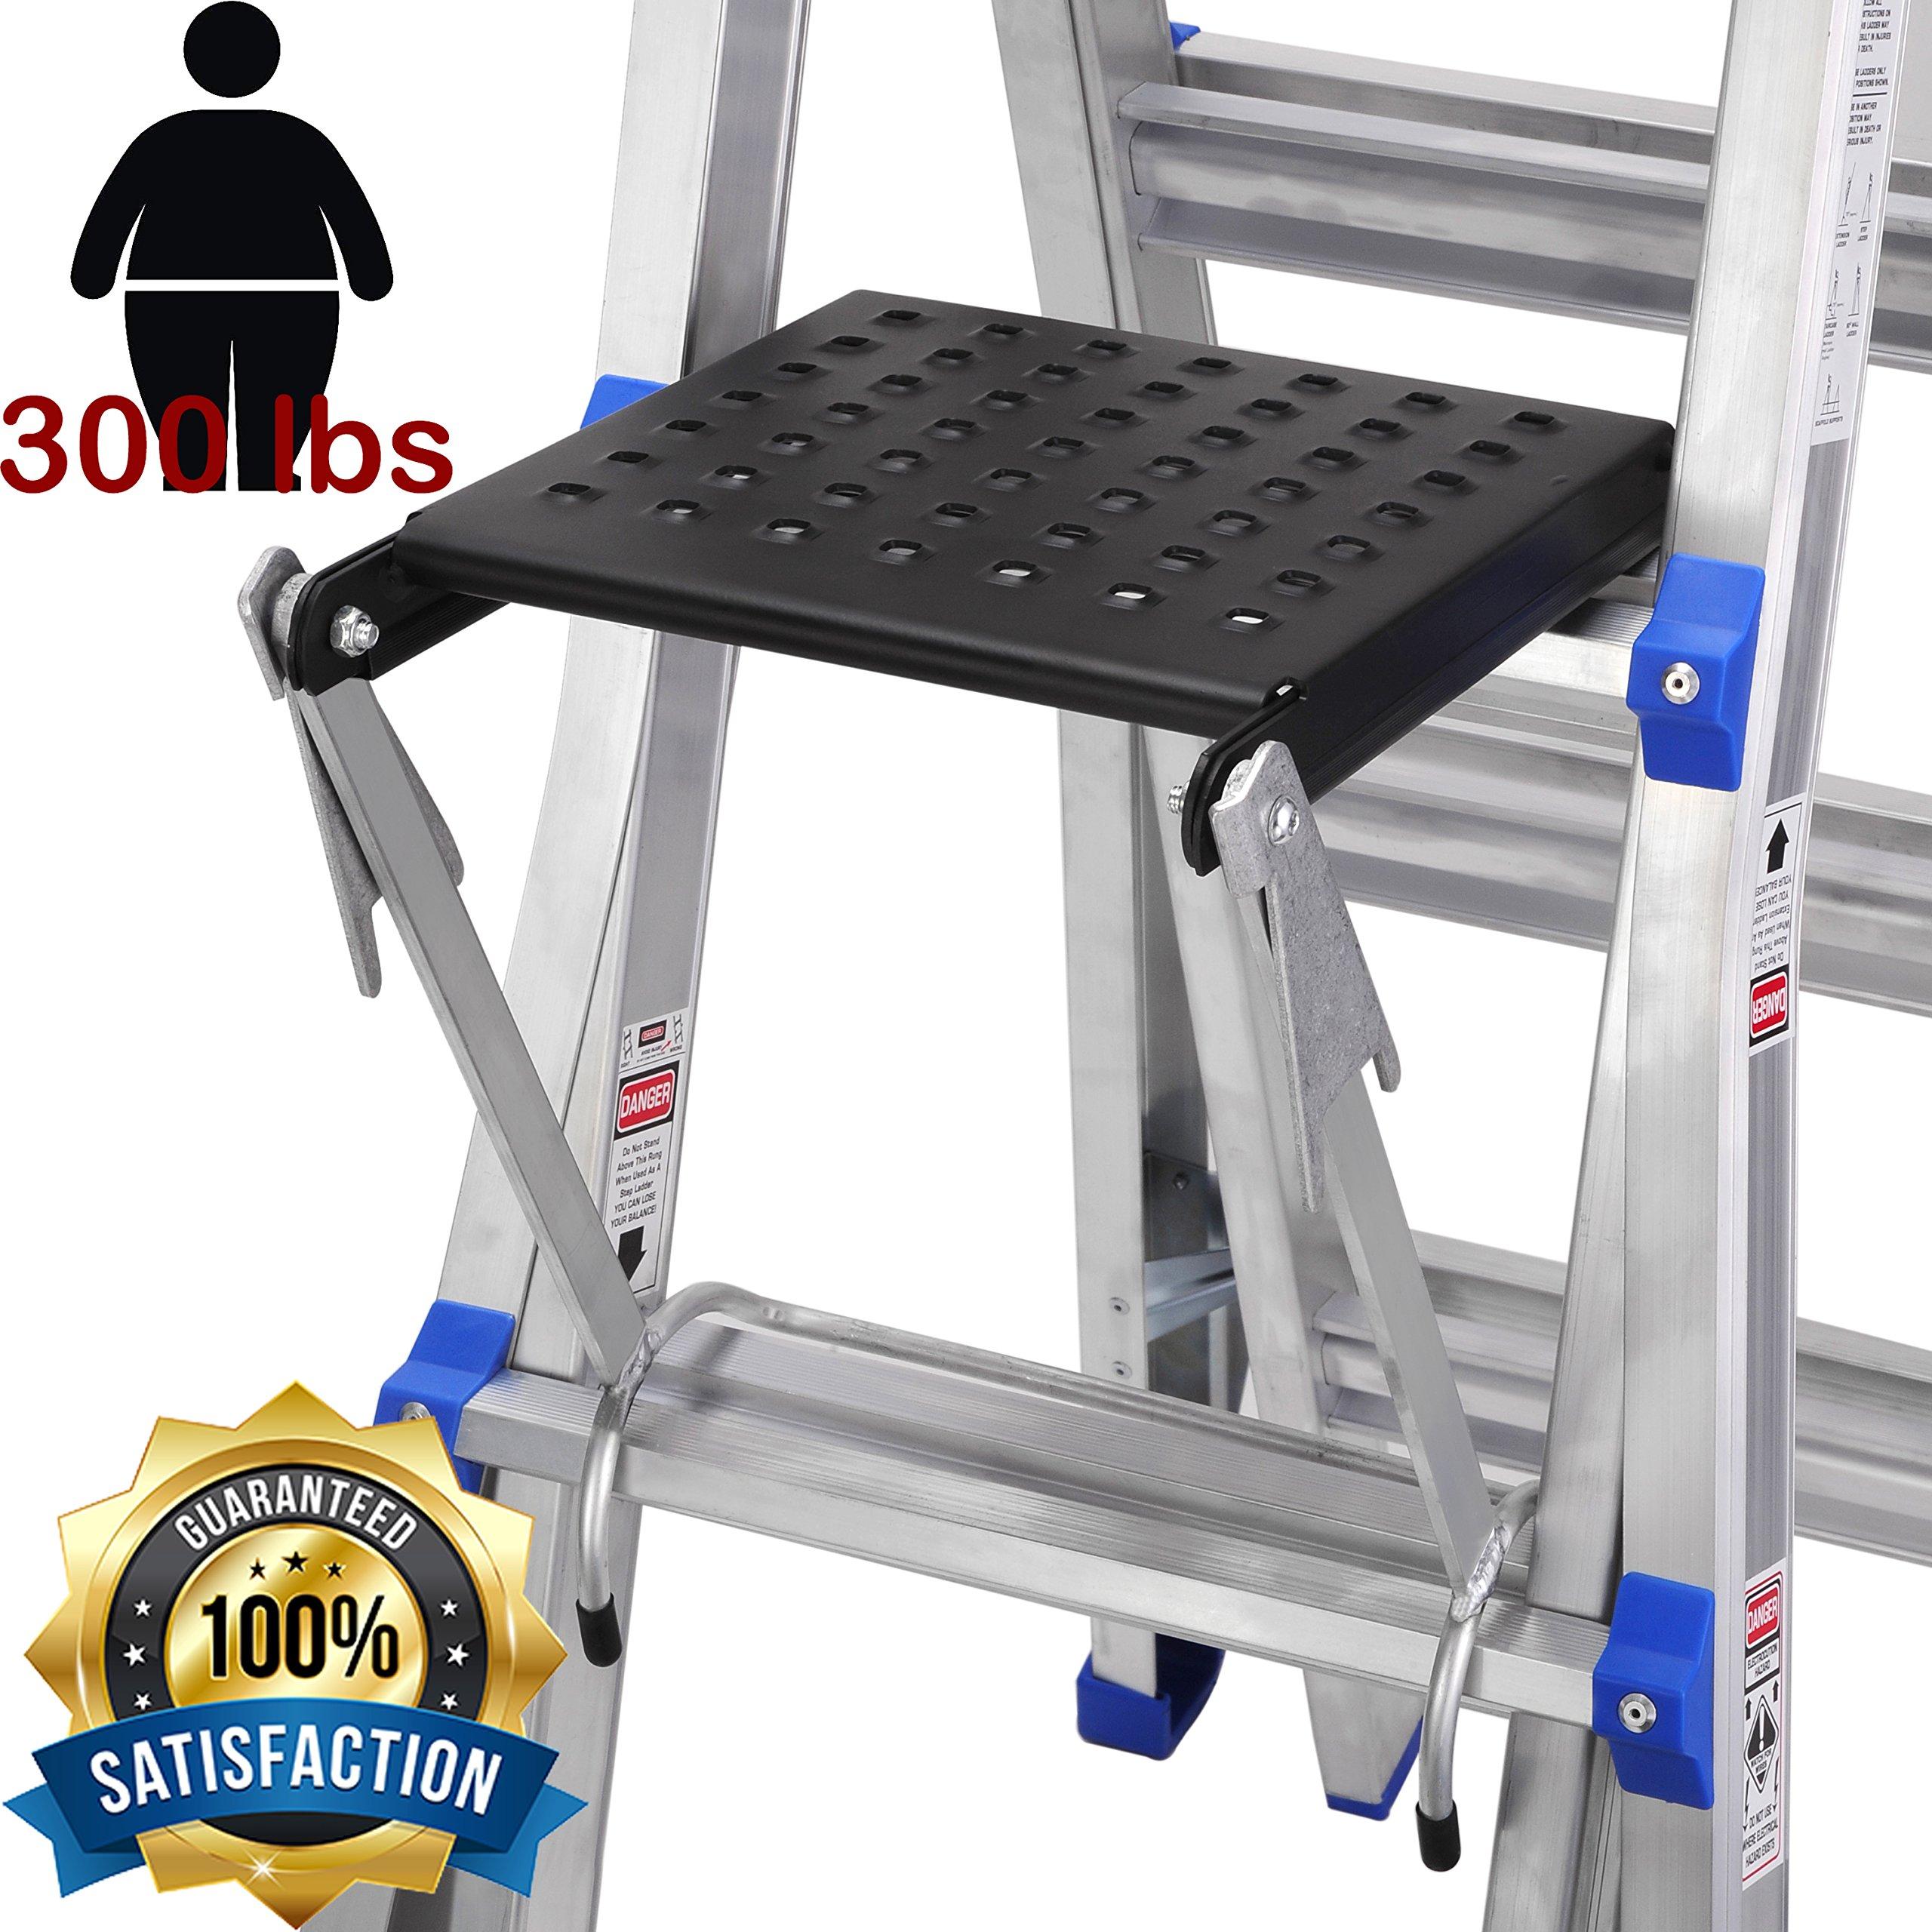 TOPRUNG 16''x15'' Work Platform for Ladders, Heavy Duty Ladder Accessory